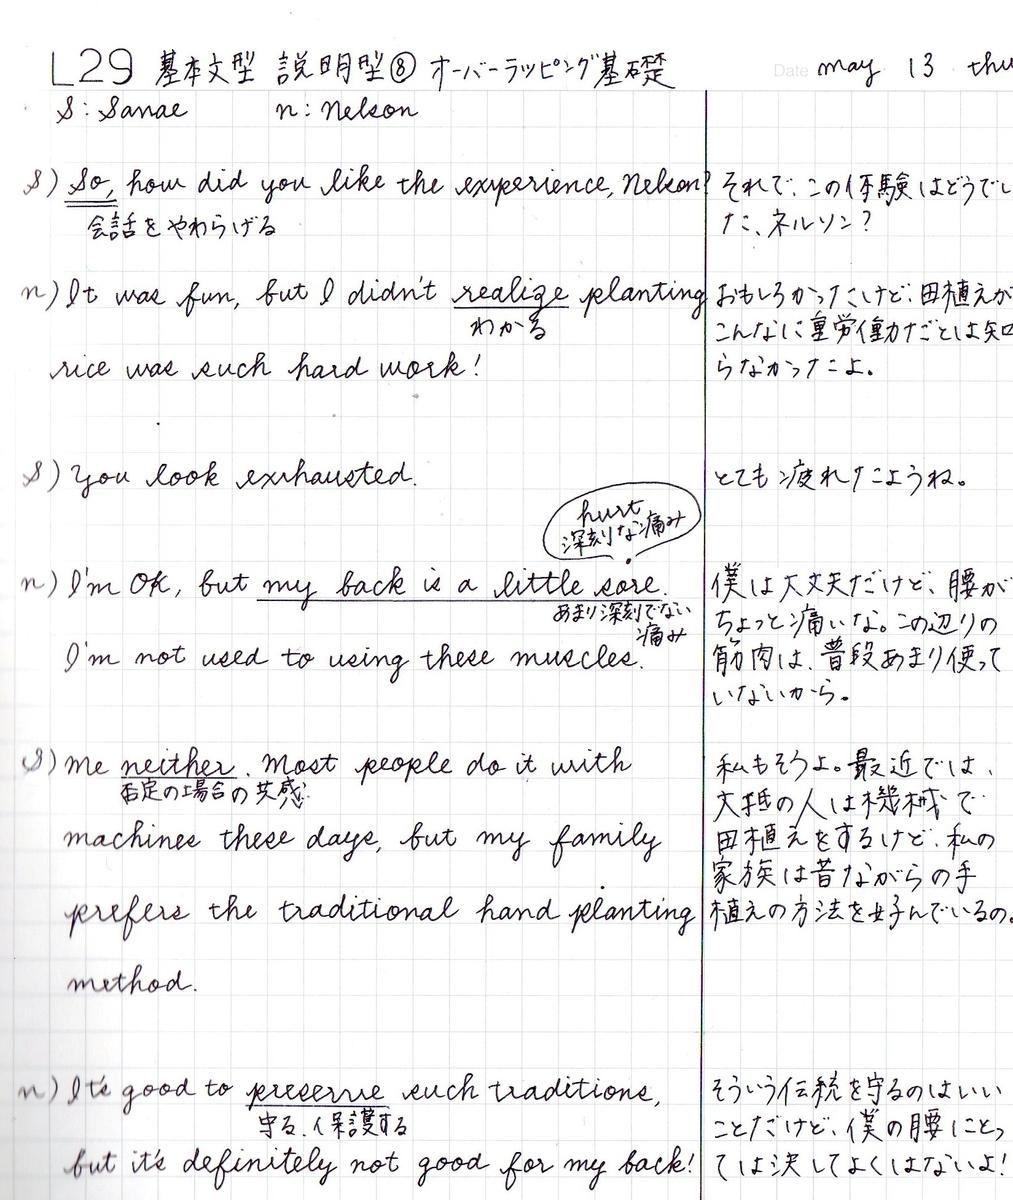 f:id:yuki-freestyle-sk8:20210520113100j:plain